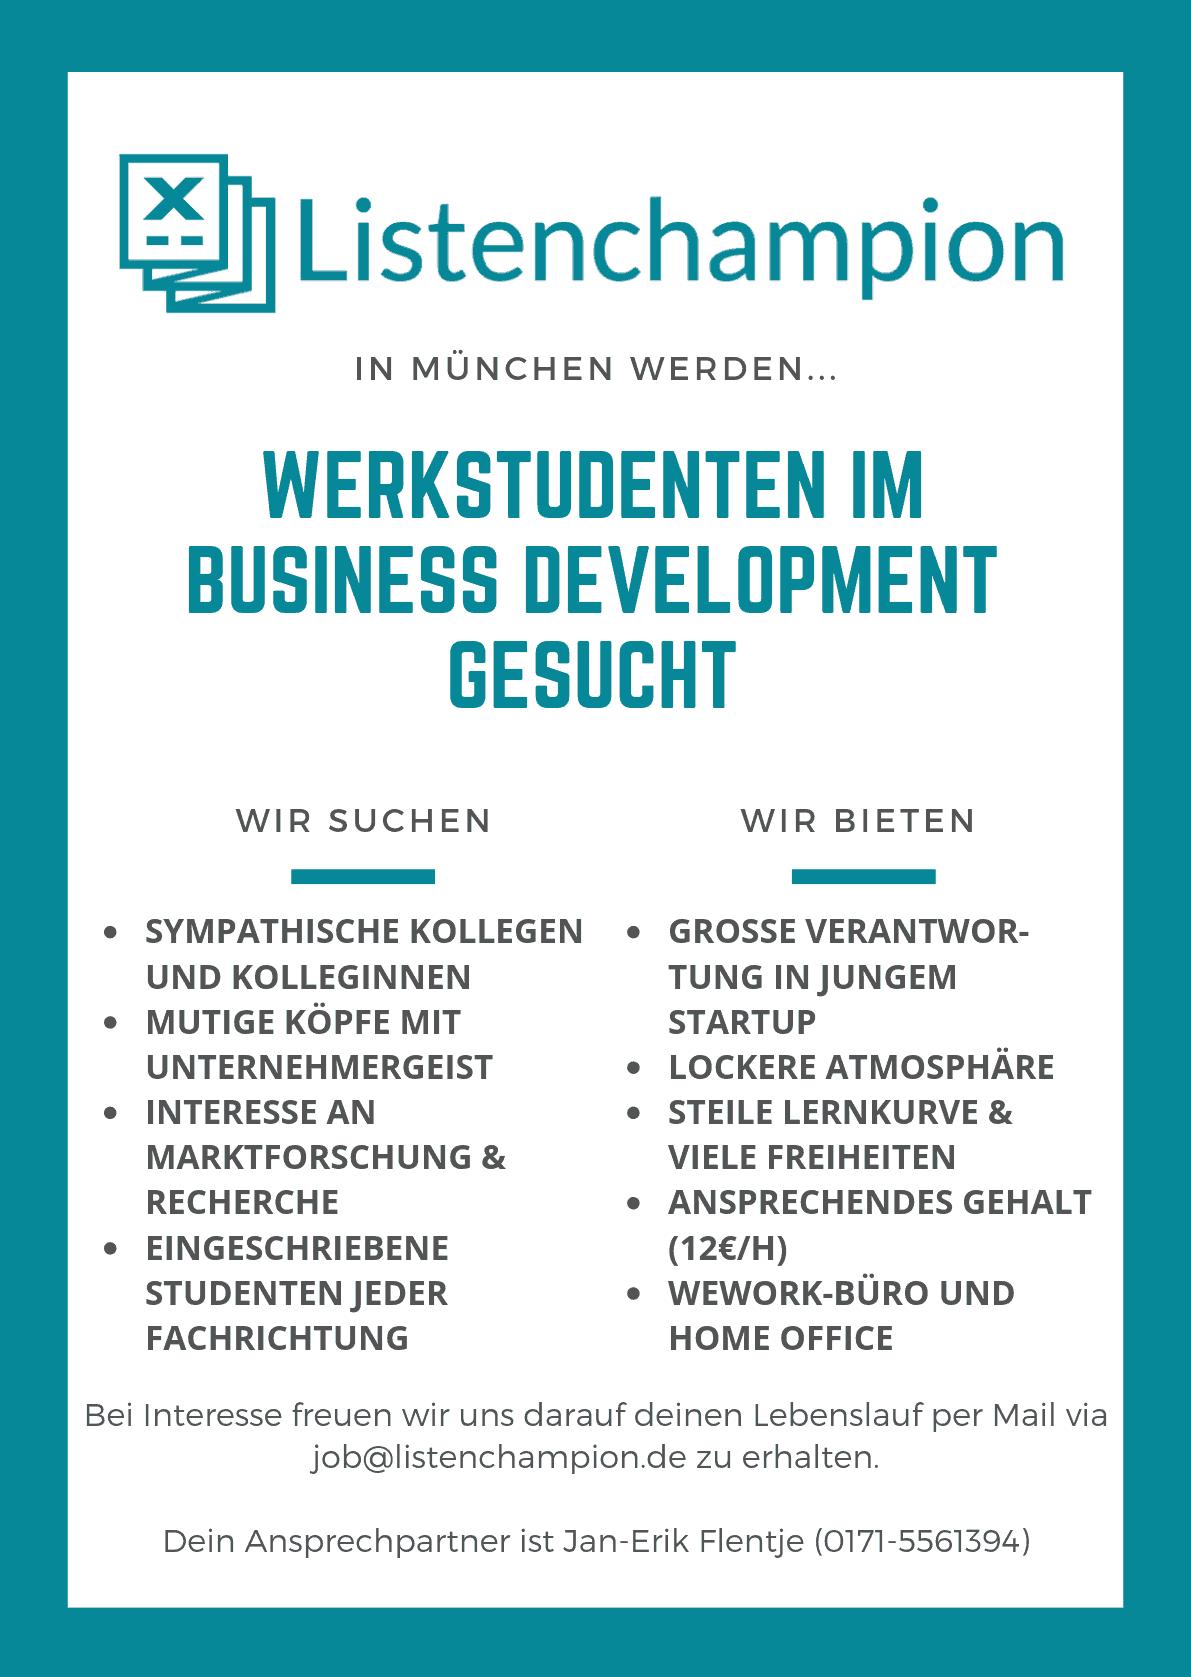 werkstudenten job münchen business development